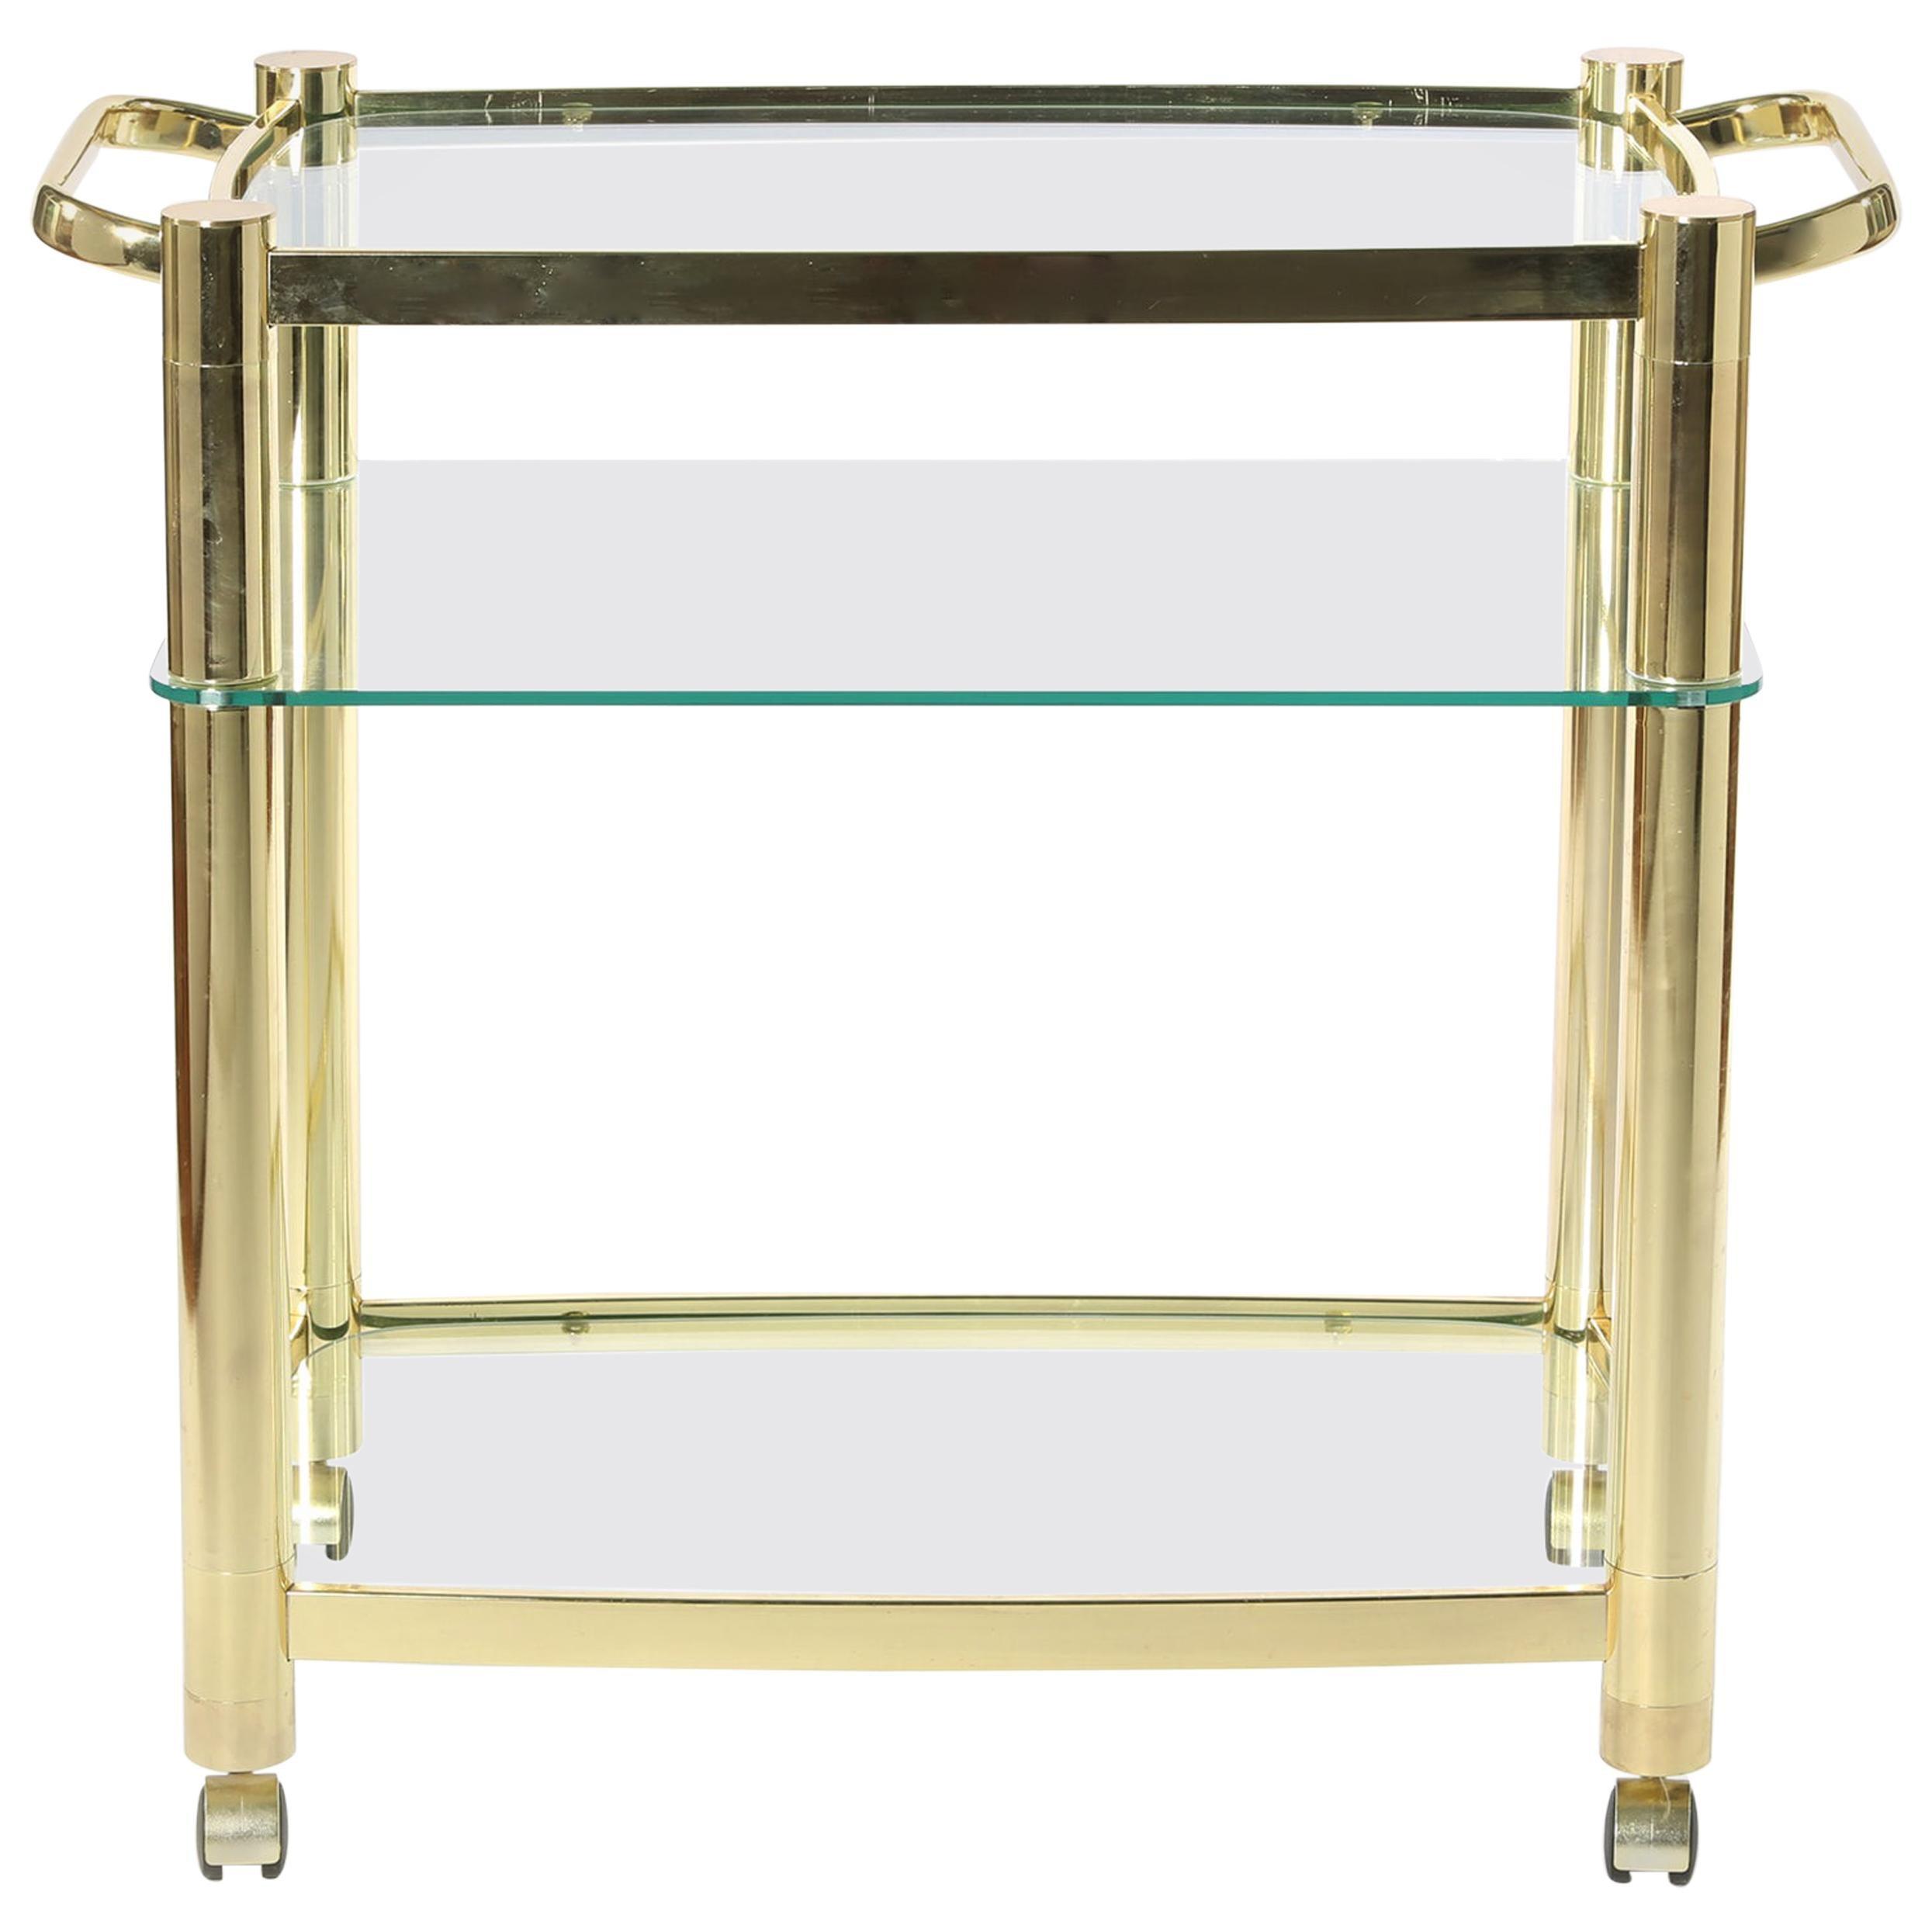 Mid-20th Century Three Glass Shelves Bar Cart